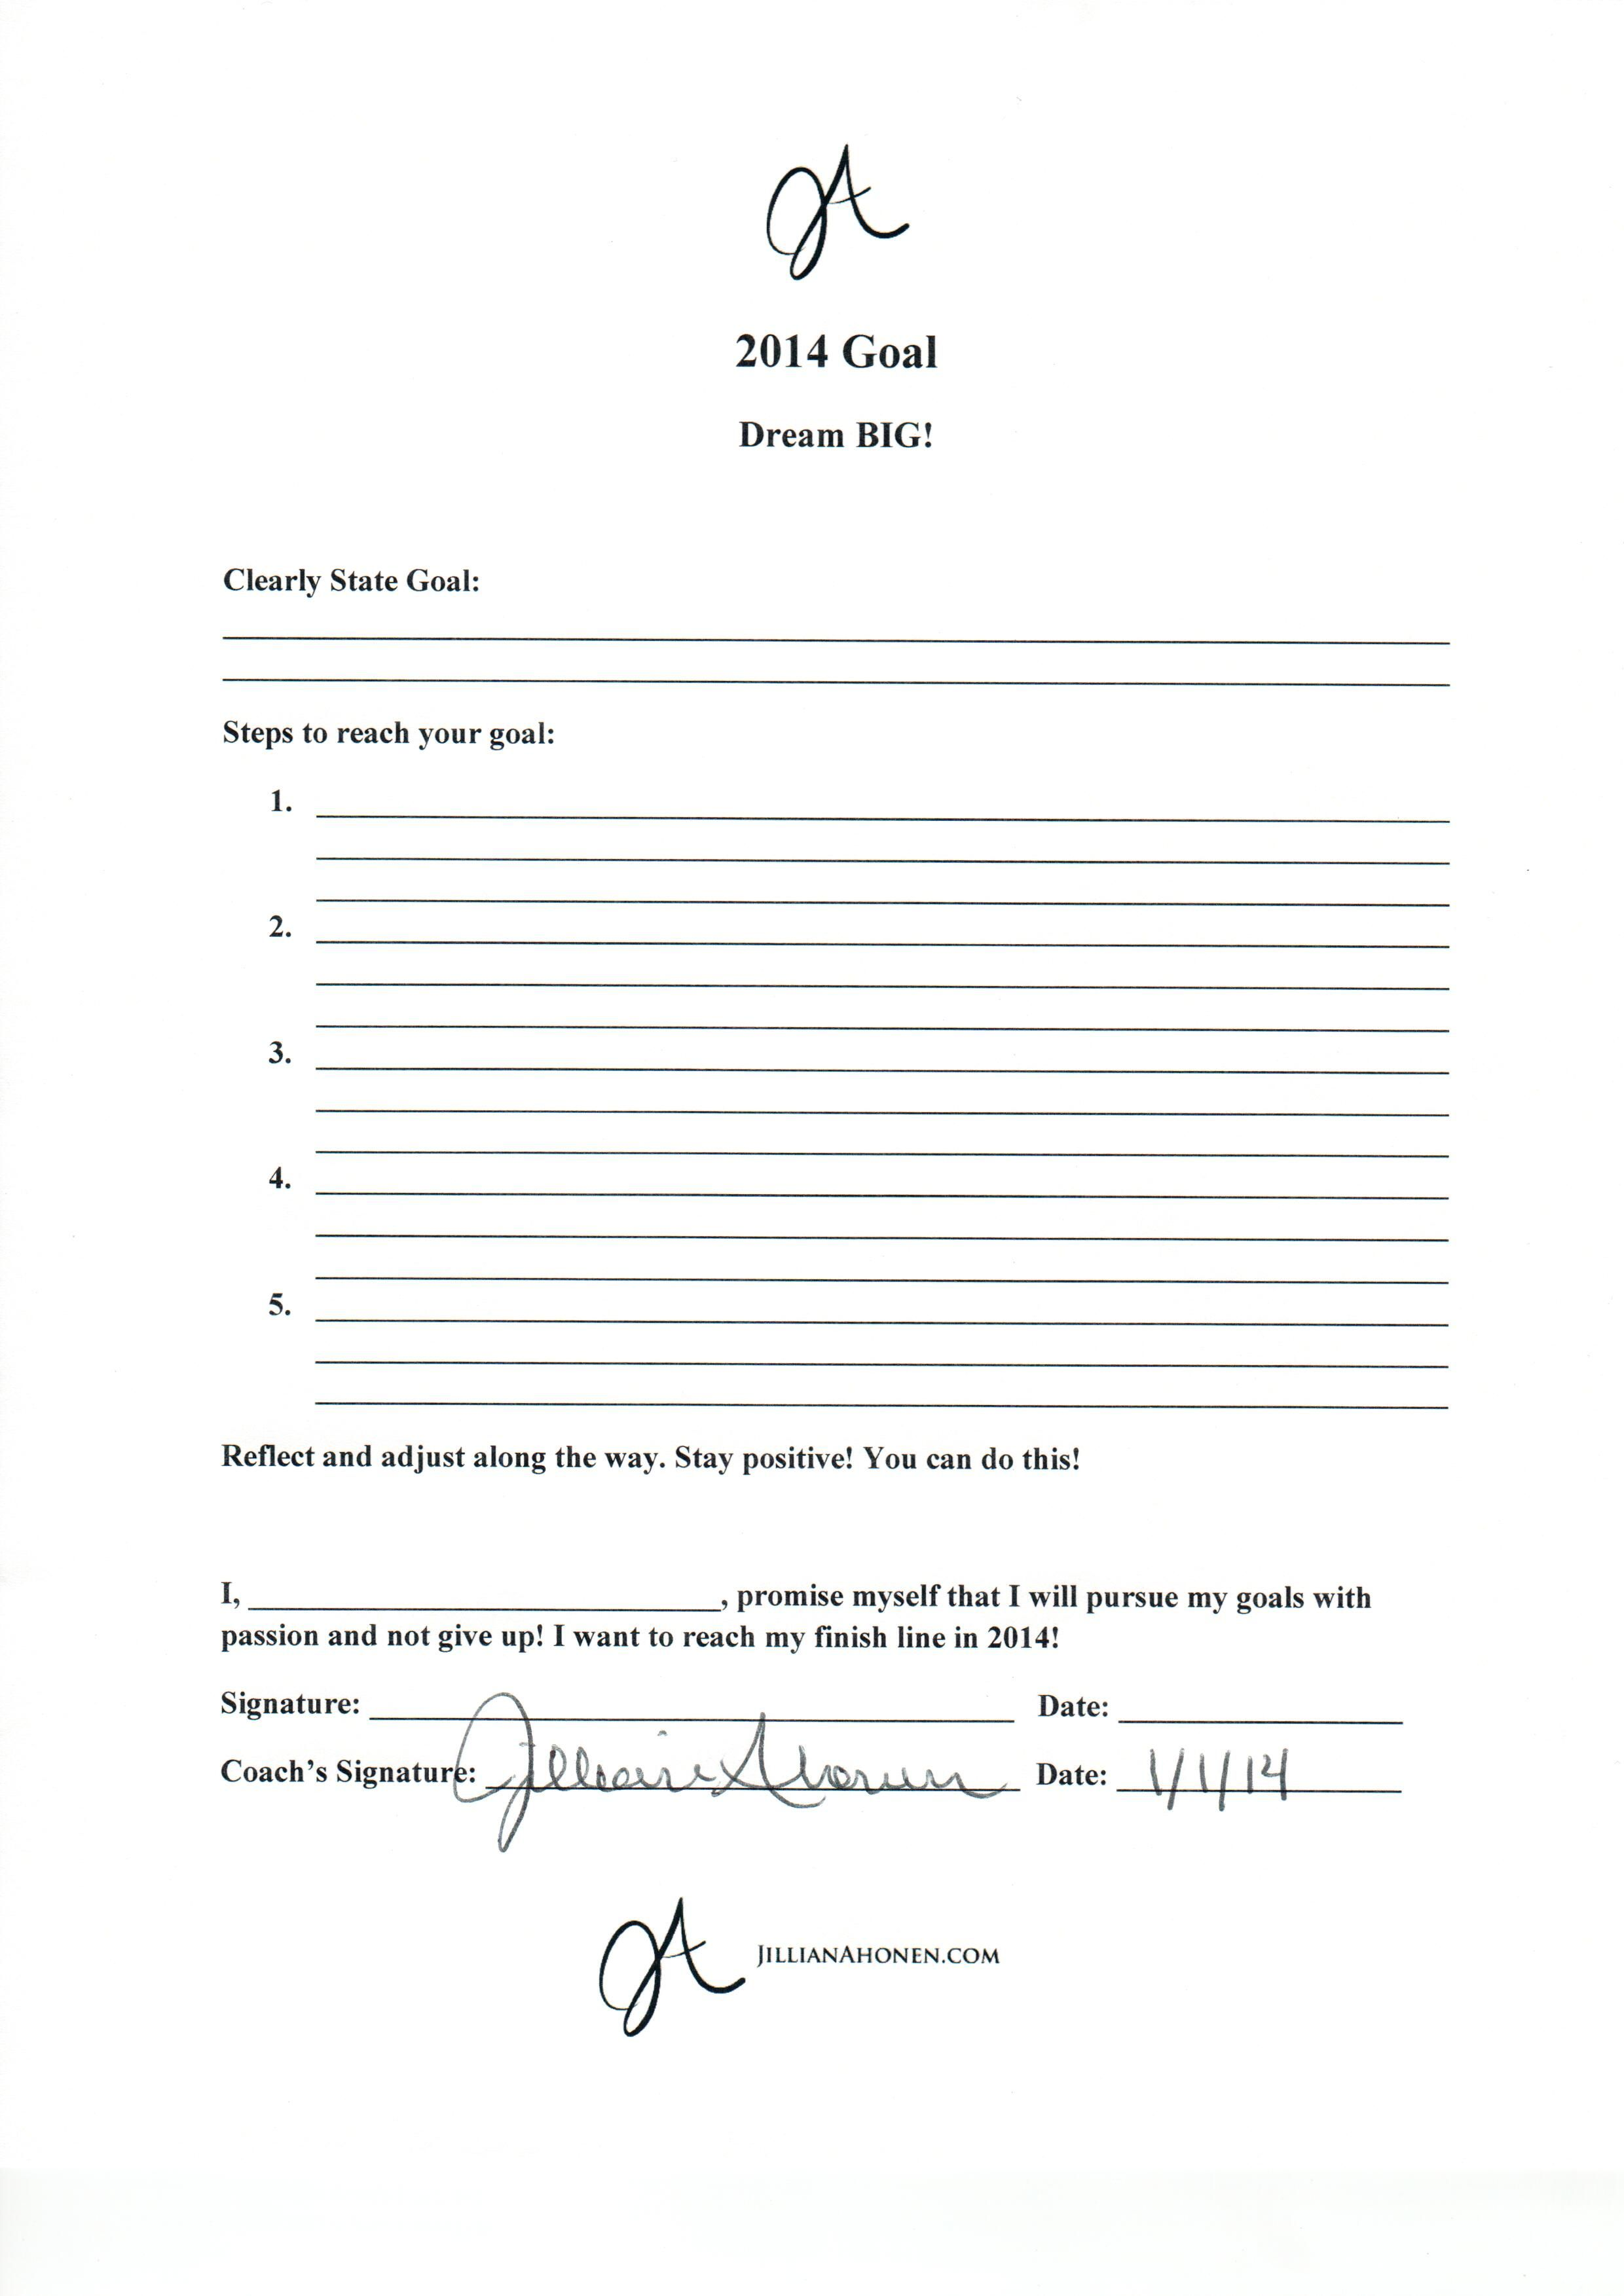 Free Printable Goal Setting Guide For Dream Big